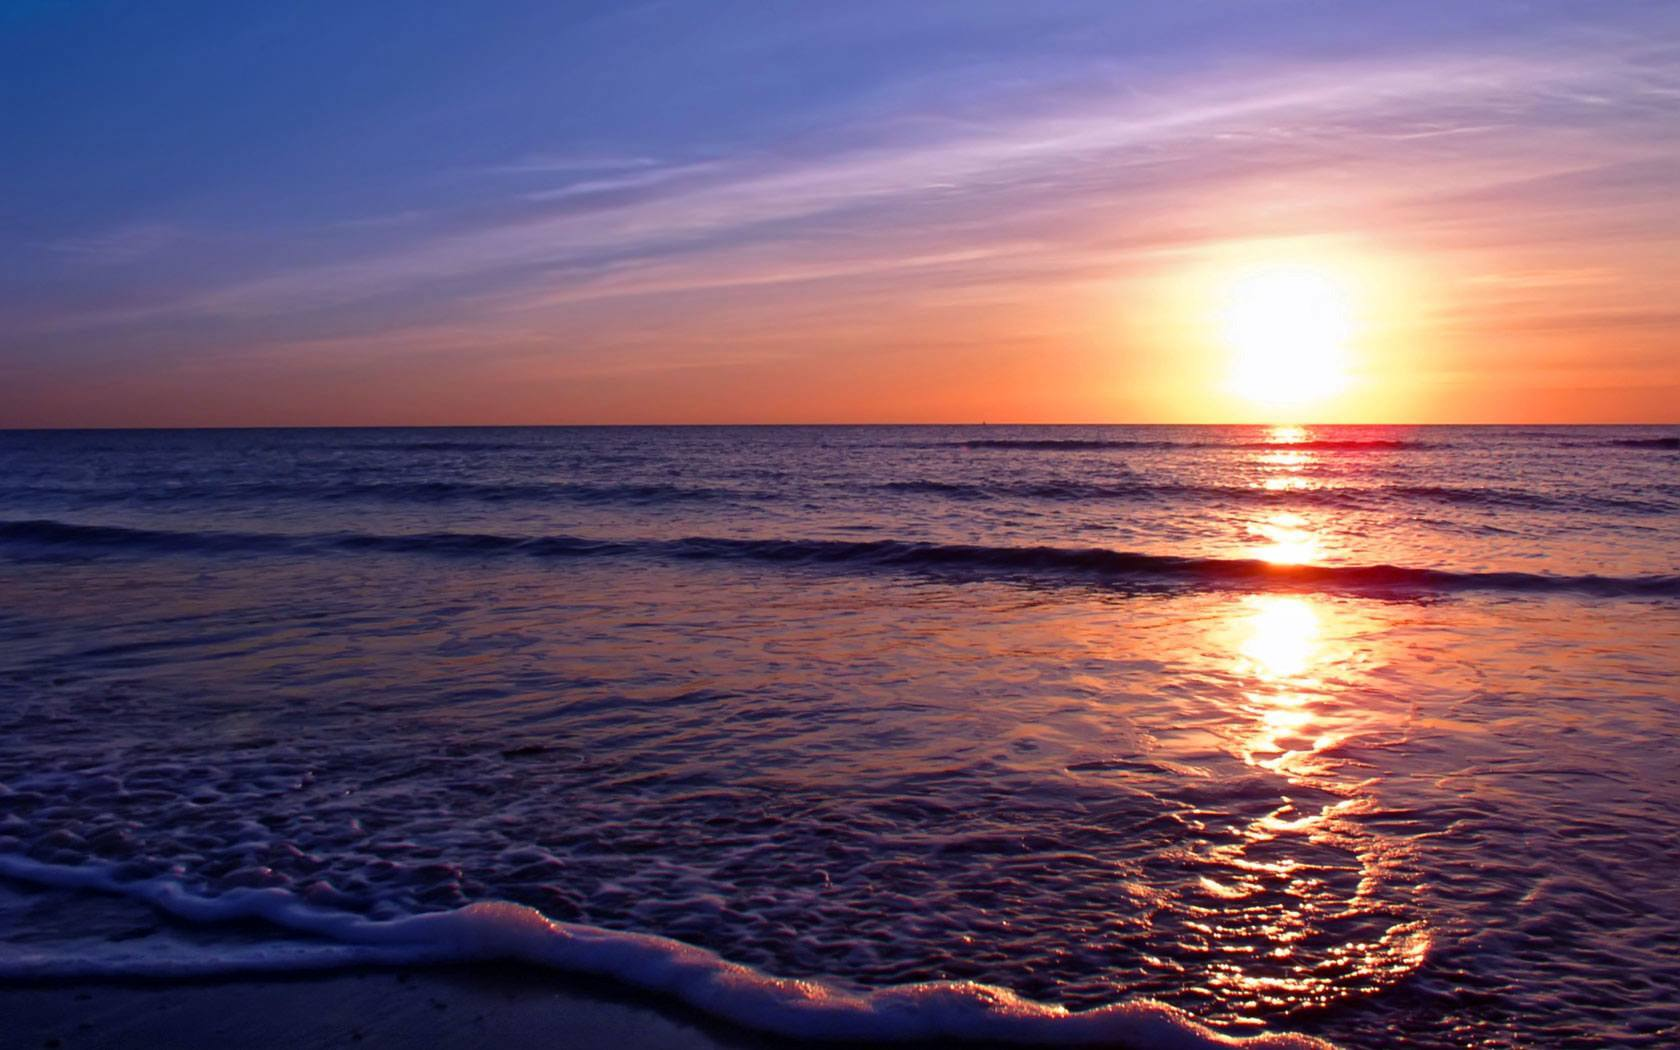 Sunset Desktop Background Posted By Zoey Peltier